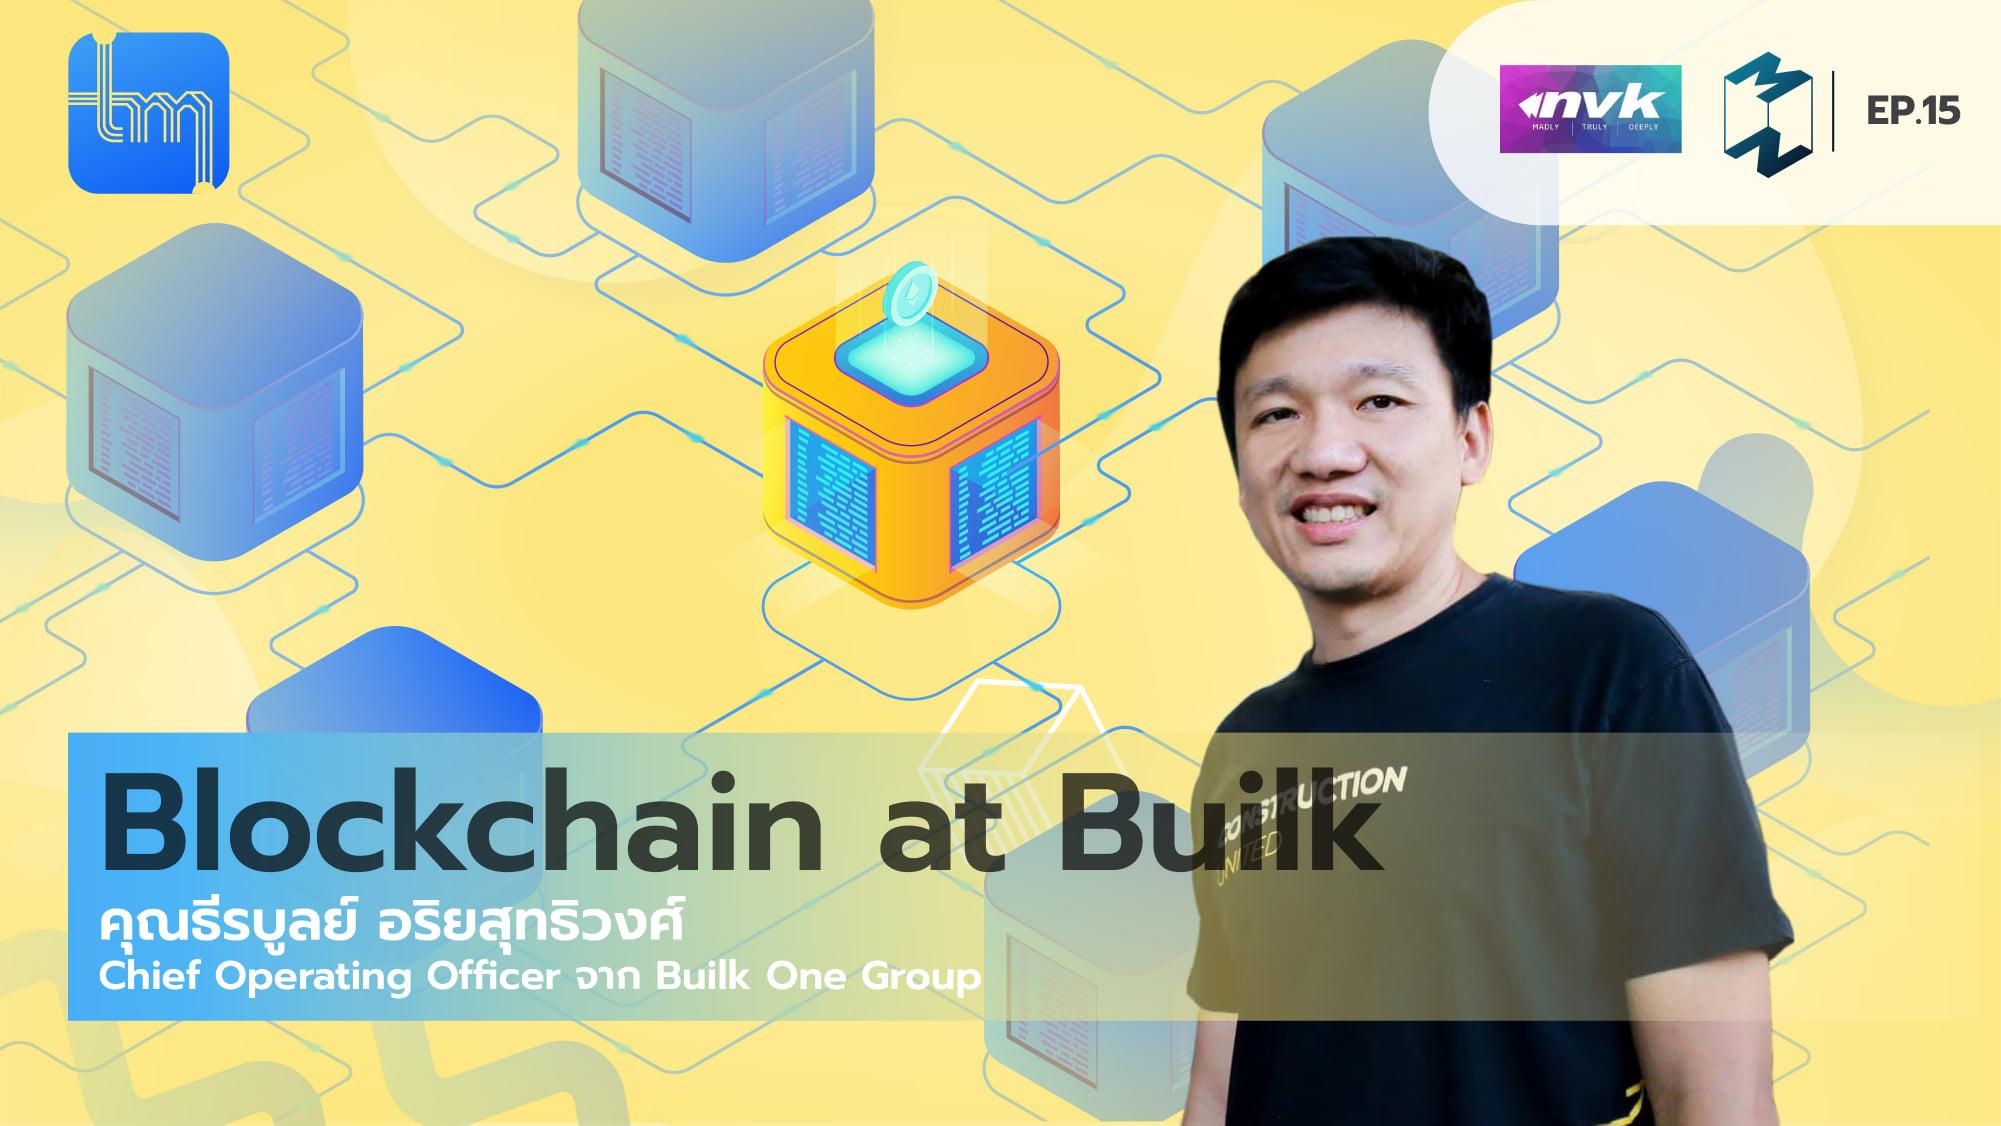 Blockchain at Builk กับคุณ ธีรบูลย์ อริยสุทธิวงศ์ | Tech Monday EP.15